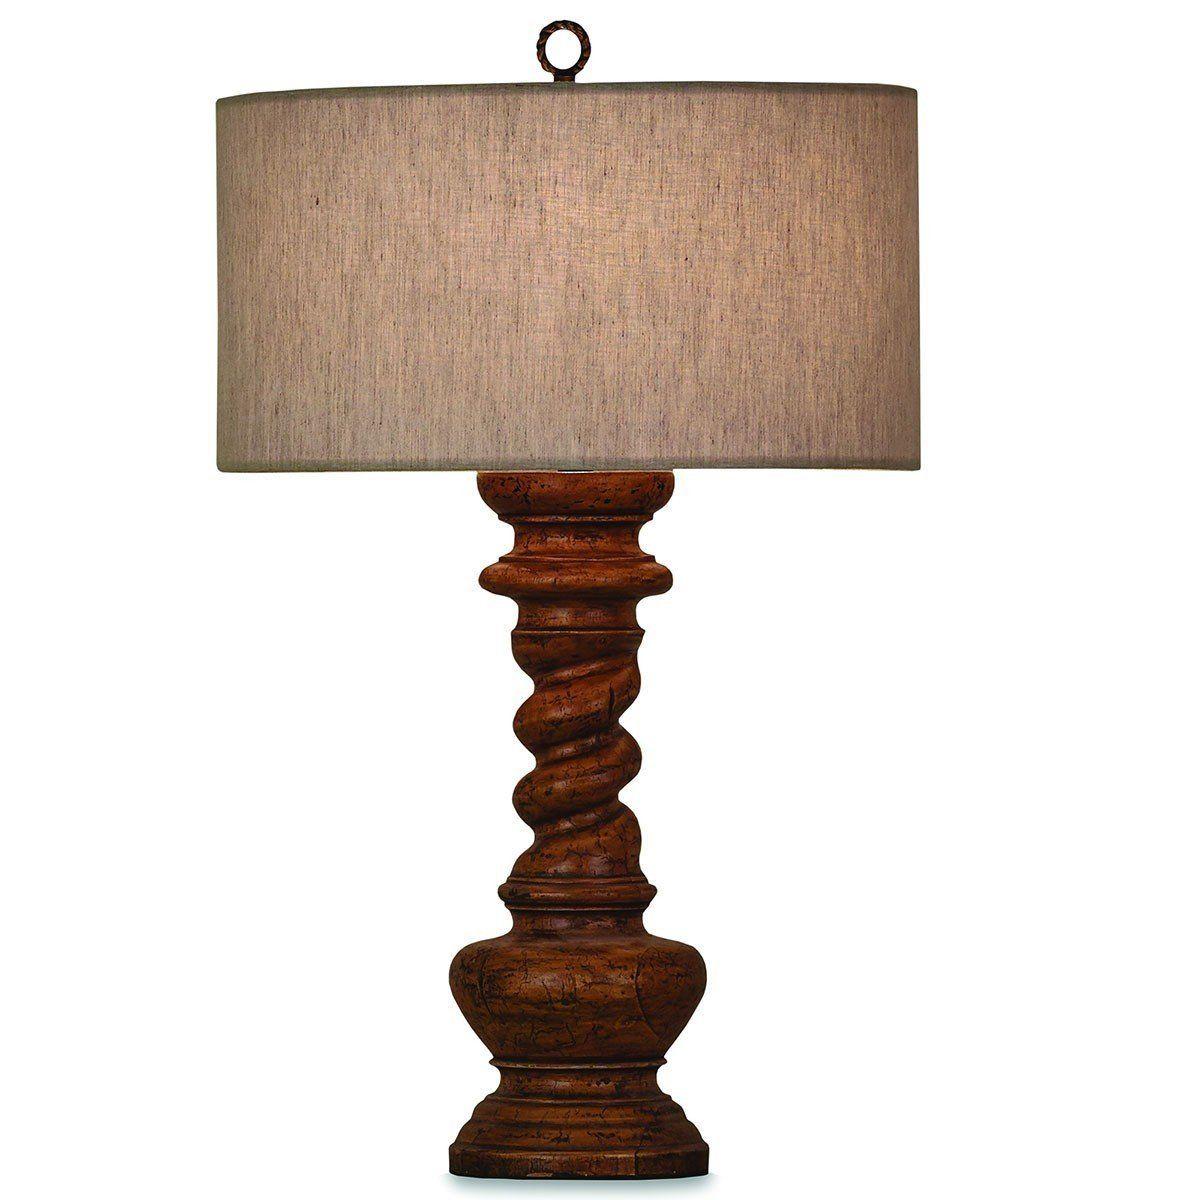 Periwinkle Table Lamp Table Lamp Lamp Furniture Decor